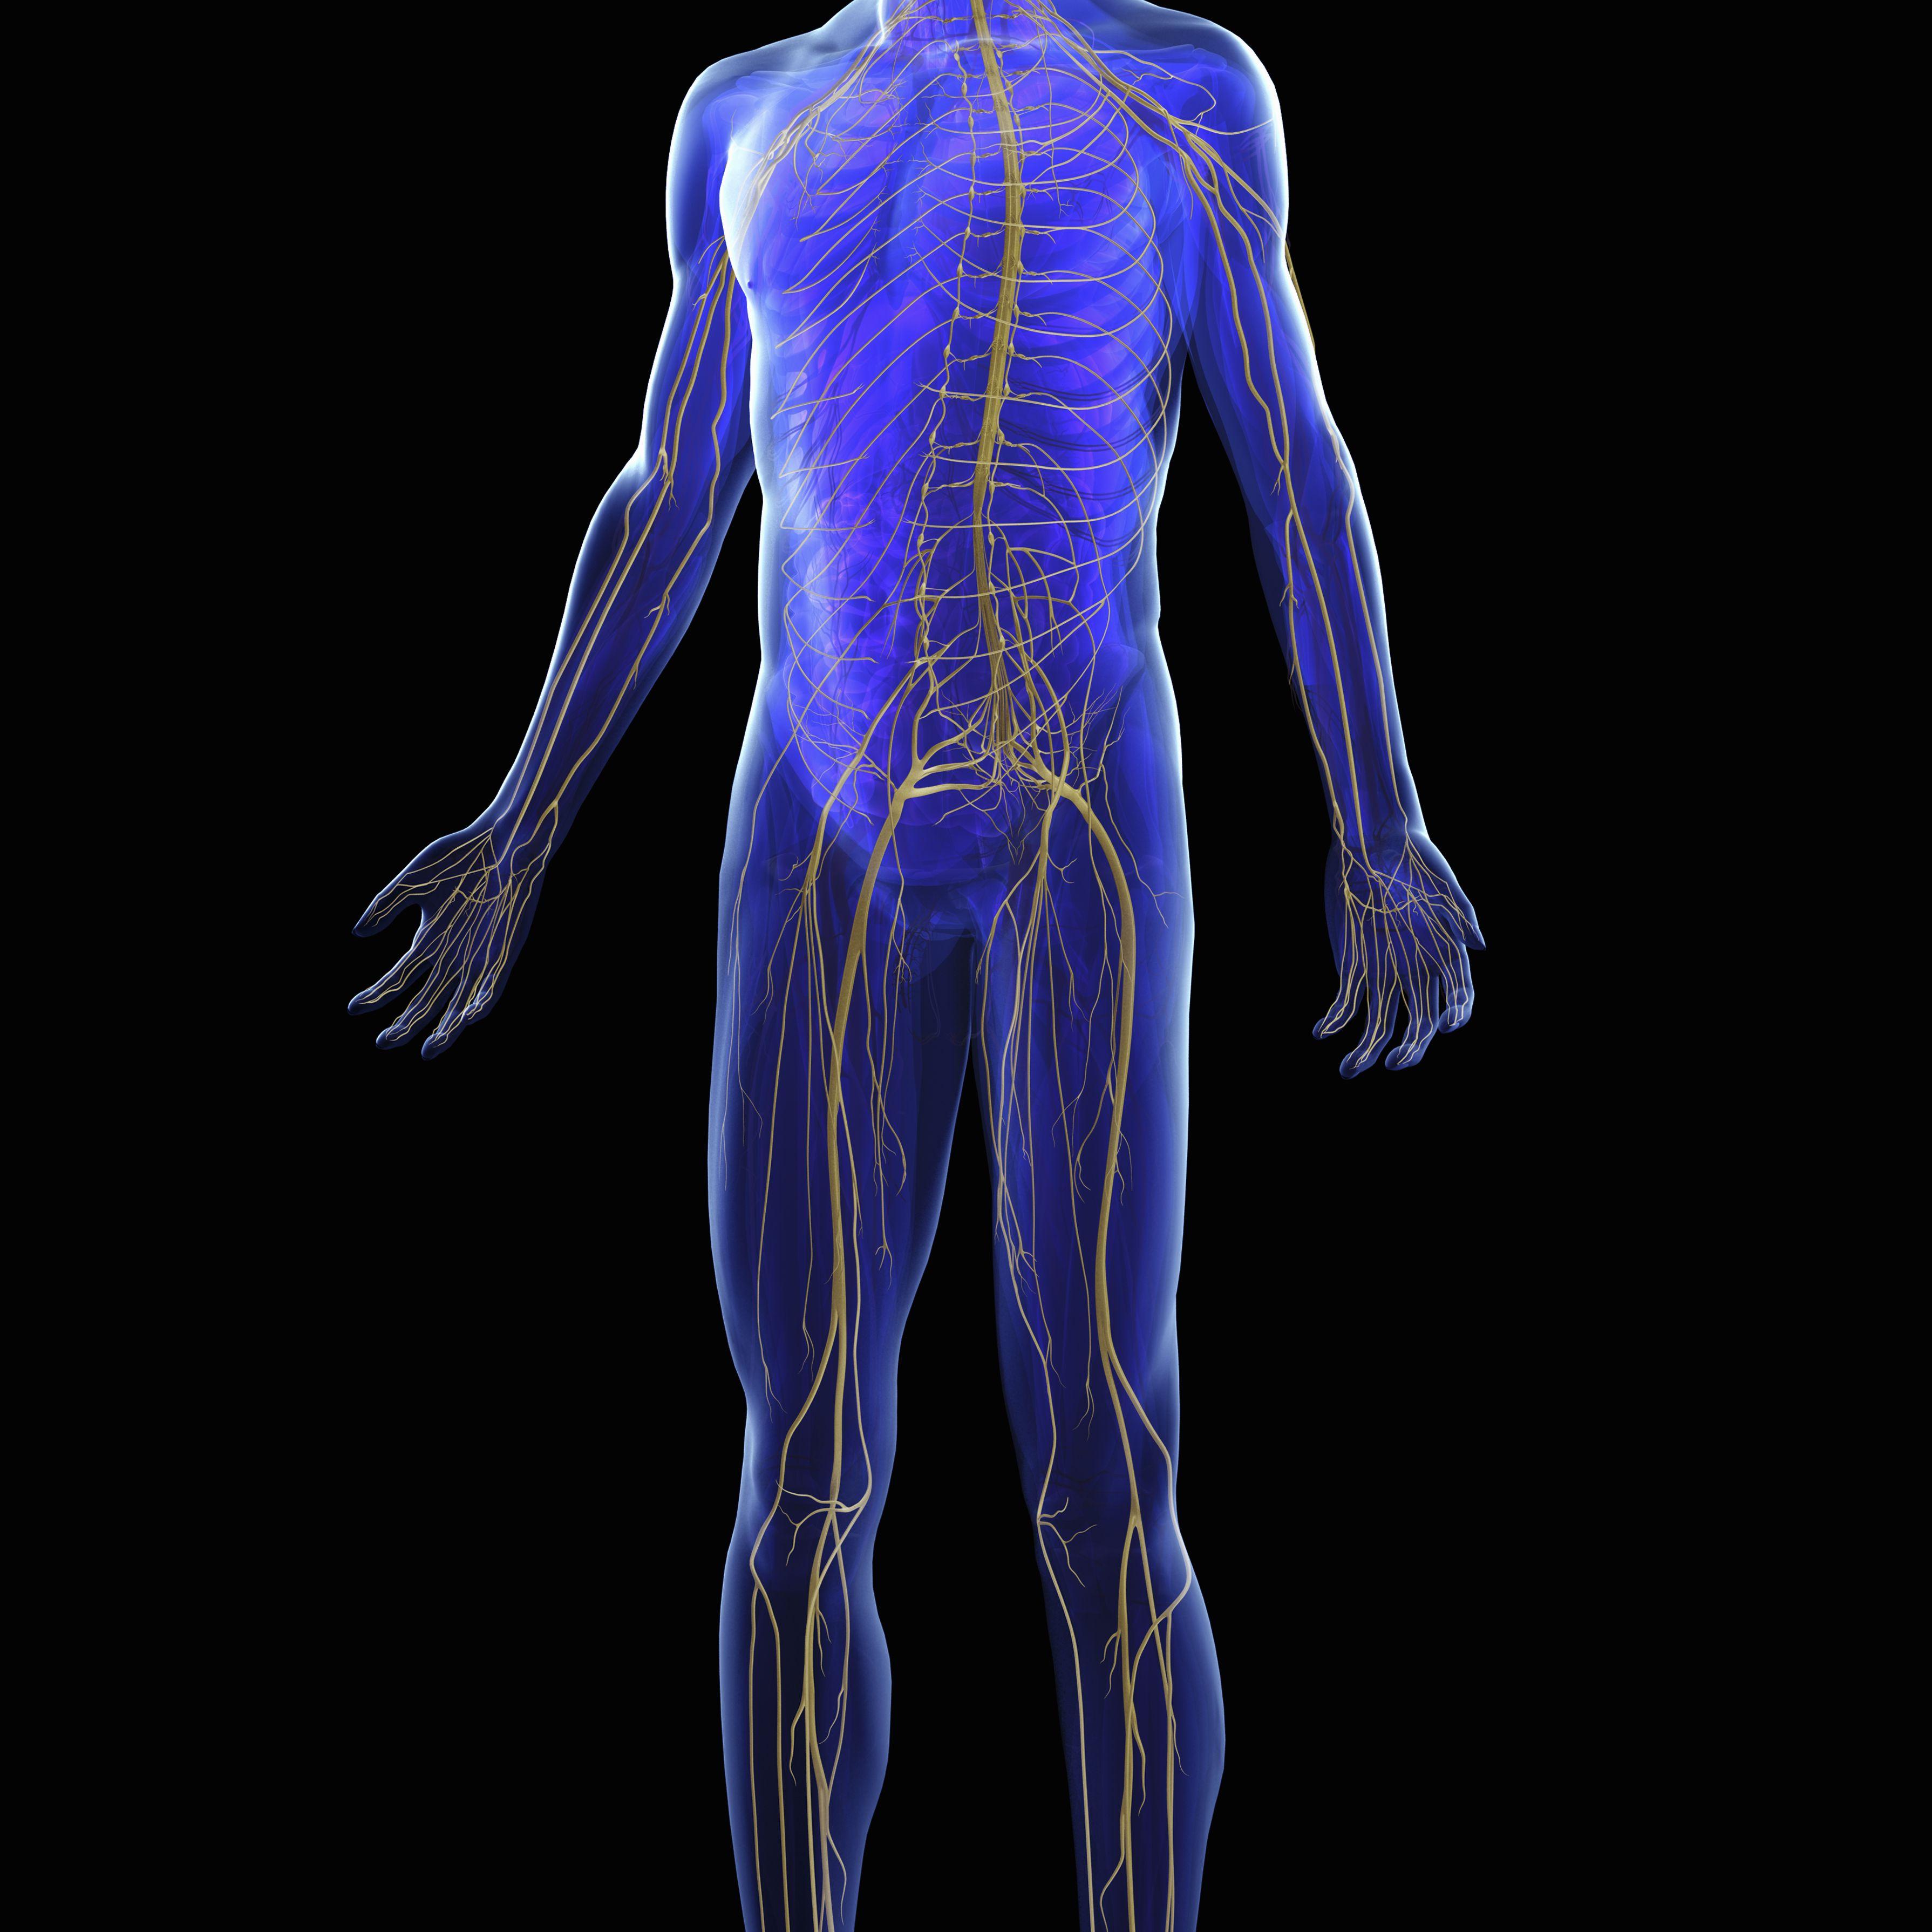 3D illustration of the human nervous system